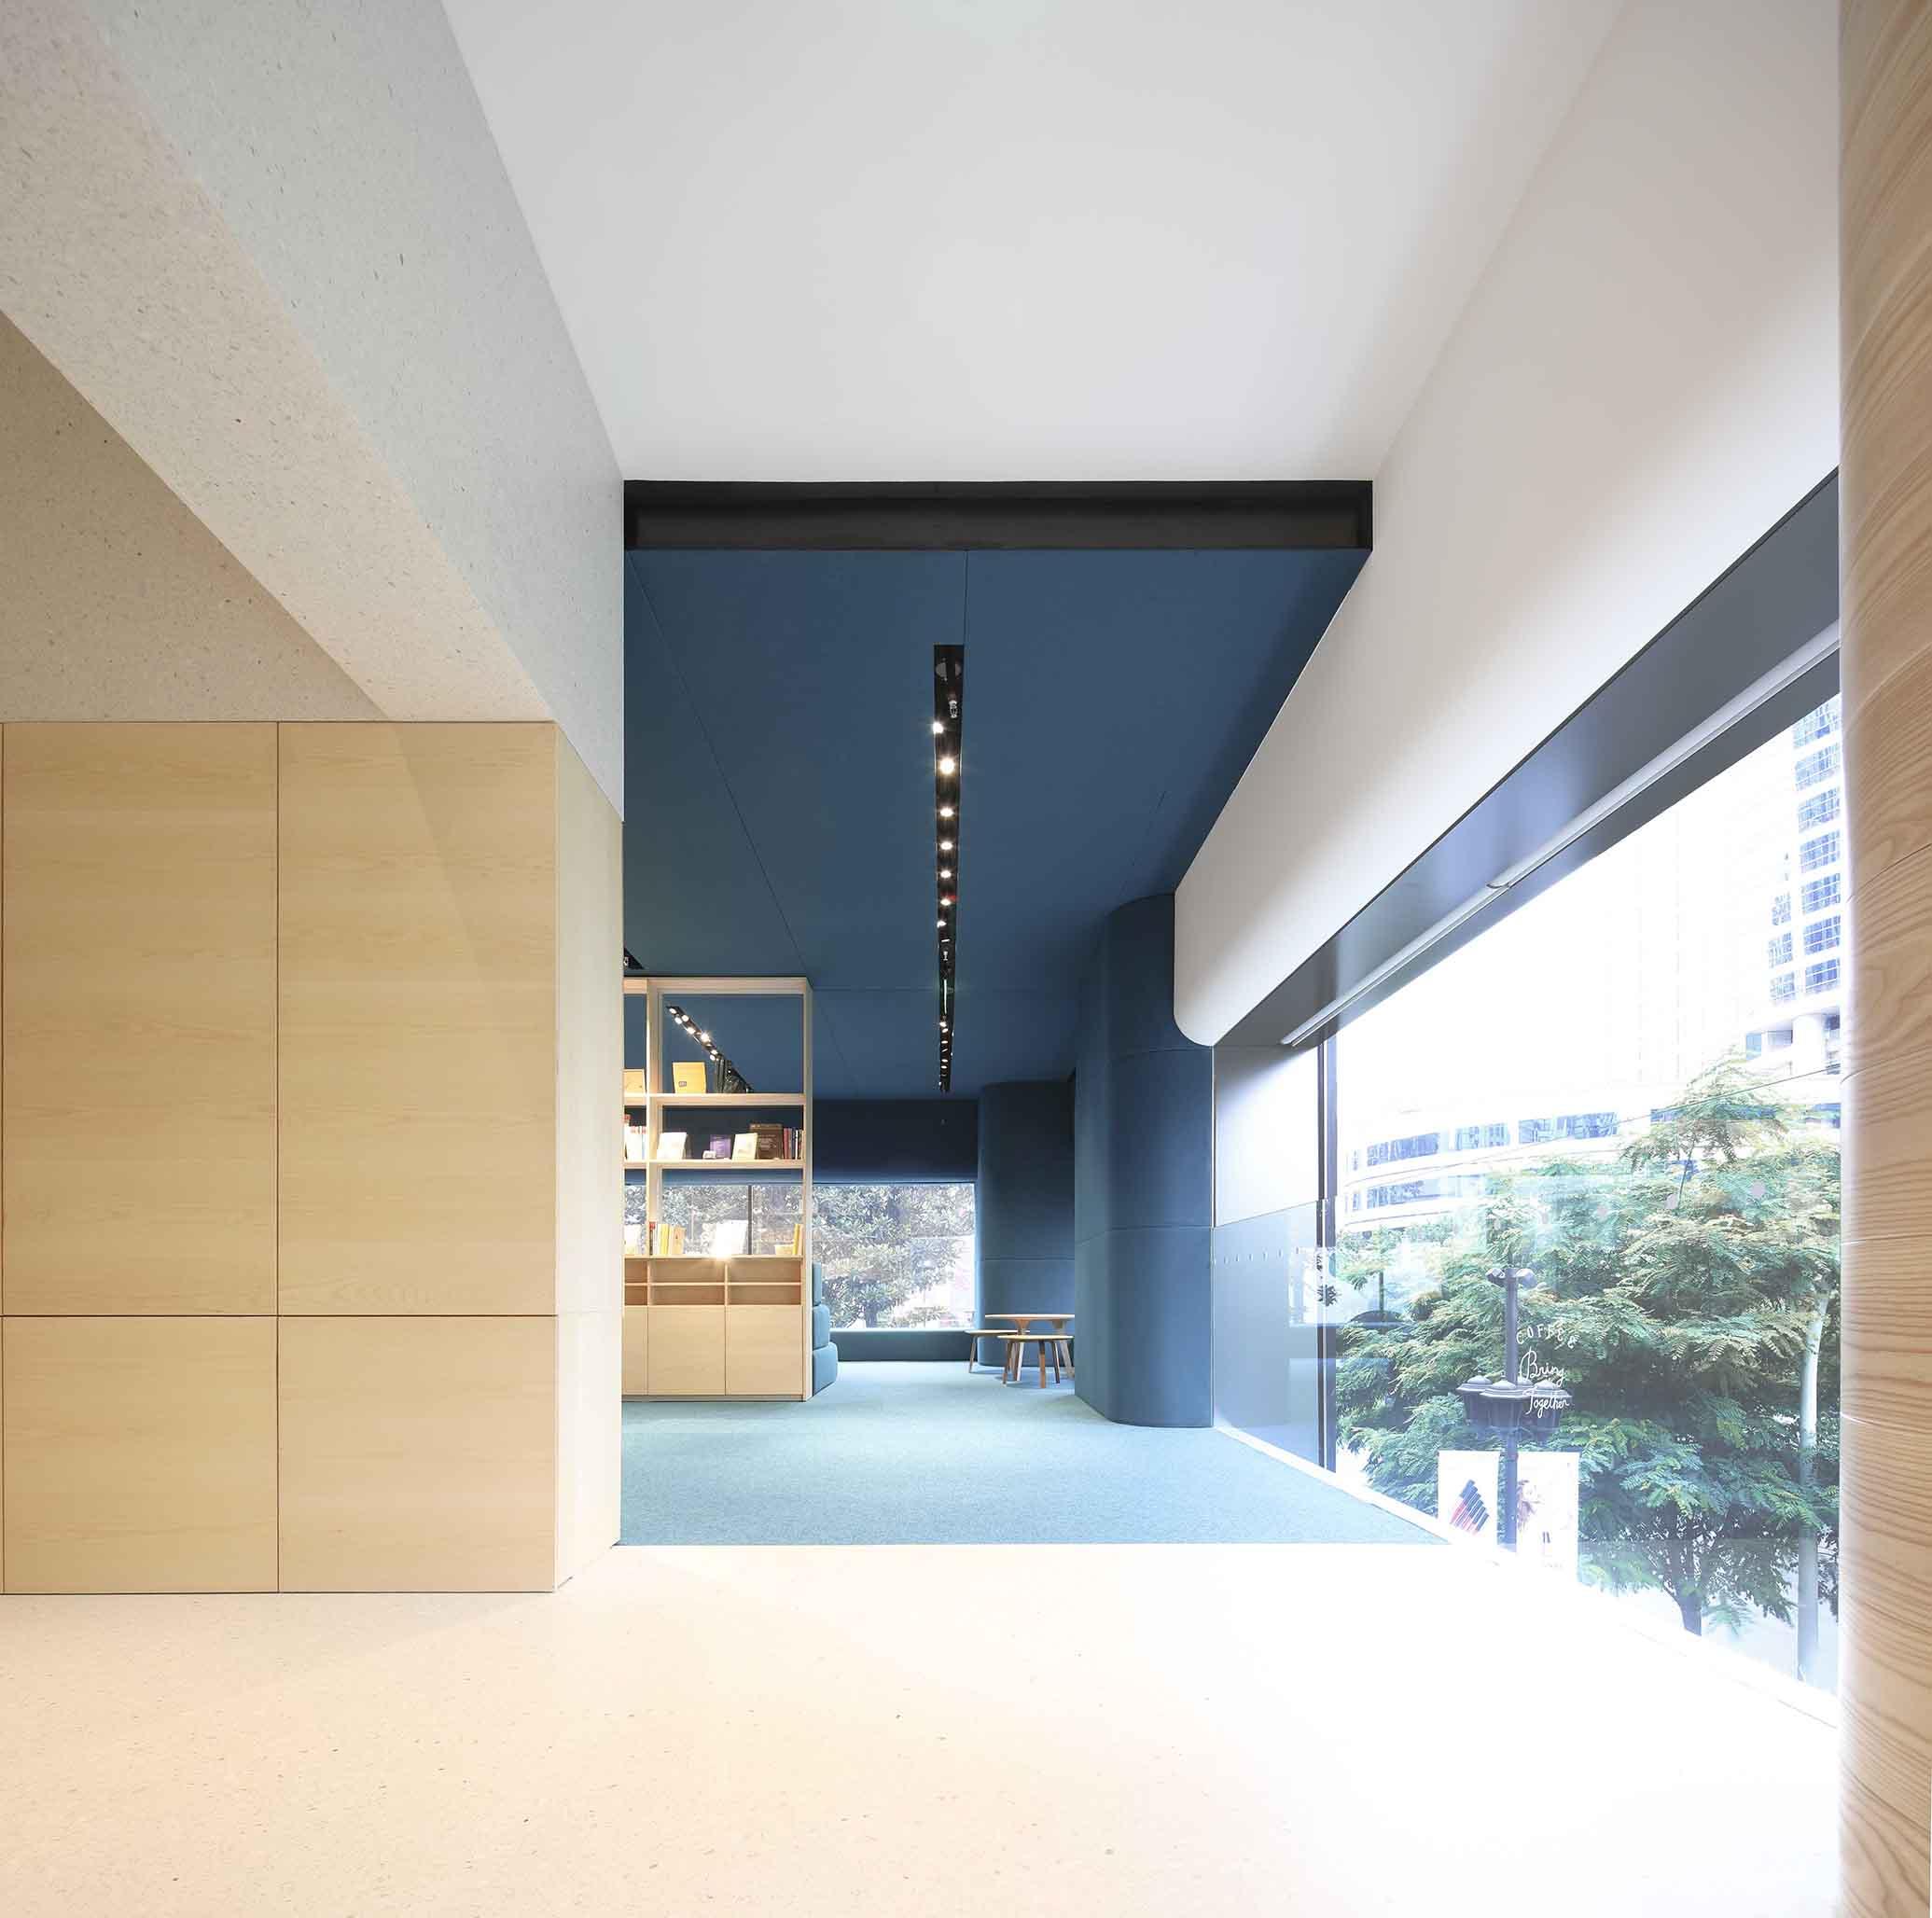 raams-architecture-studio-design-german-roig-garcia-architect-electric-car-coche-electrico-shanghai-china-nio-house-SHL_NIO-Showroom_@RawVision_07.jpg